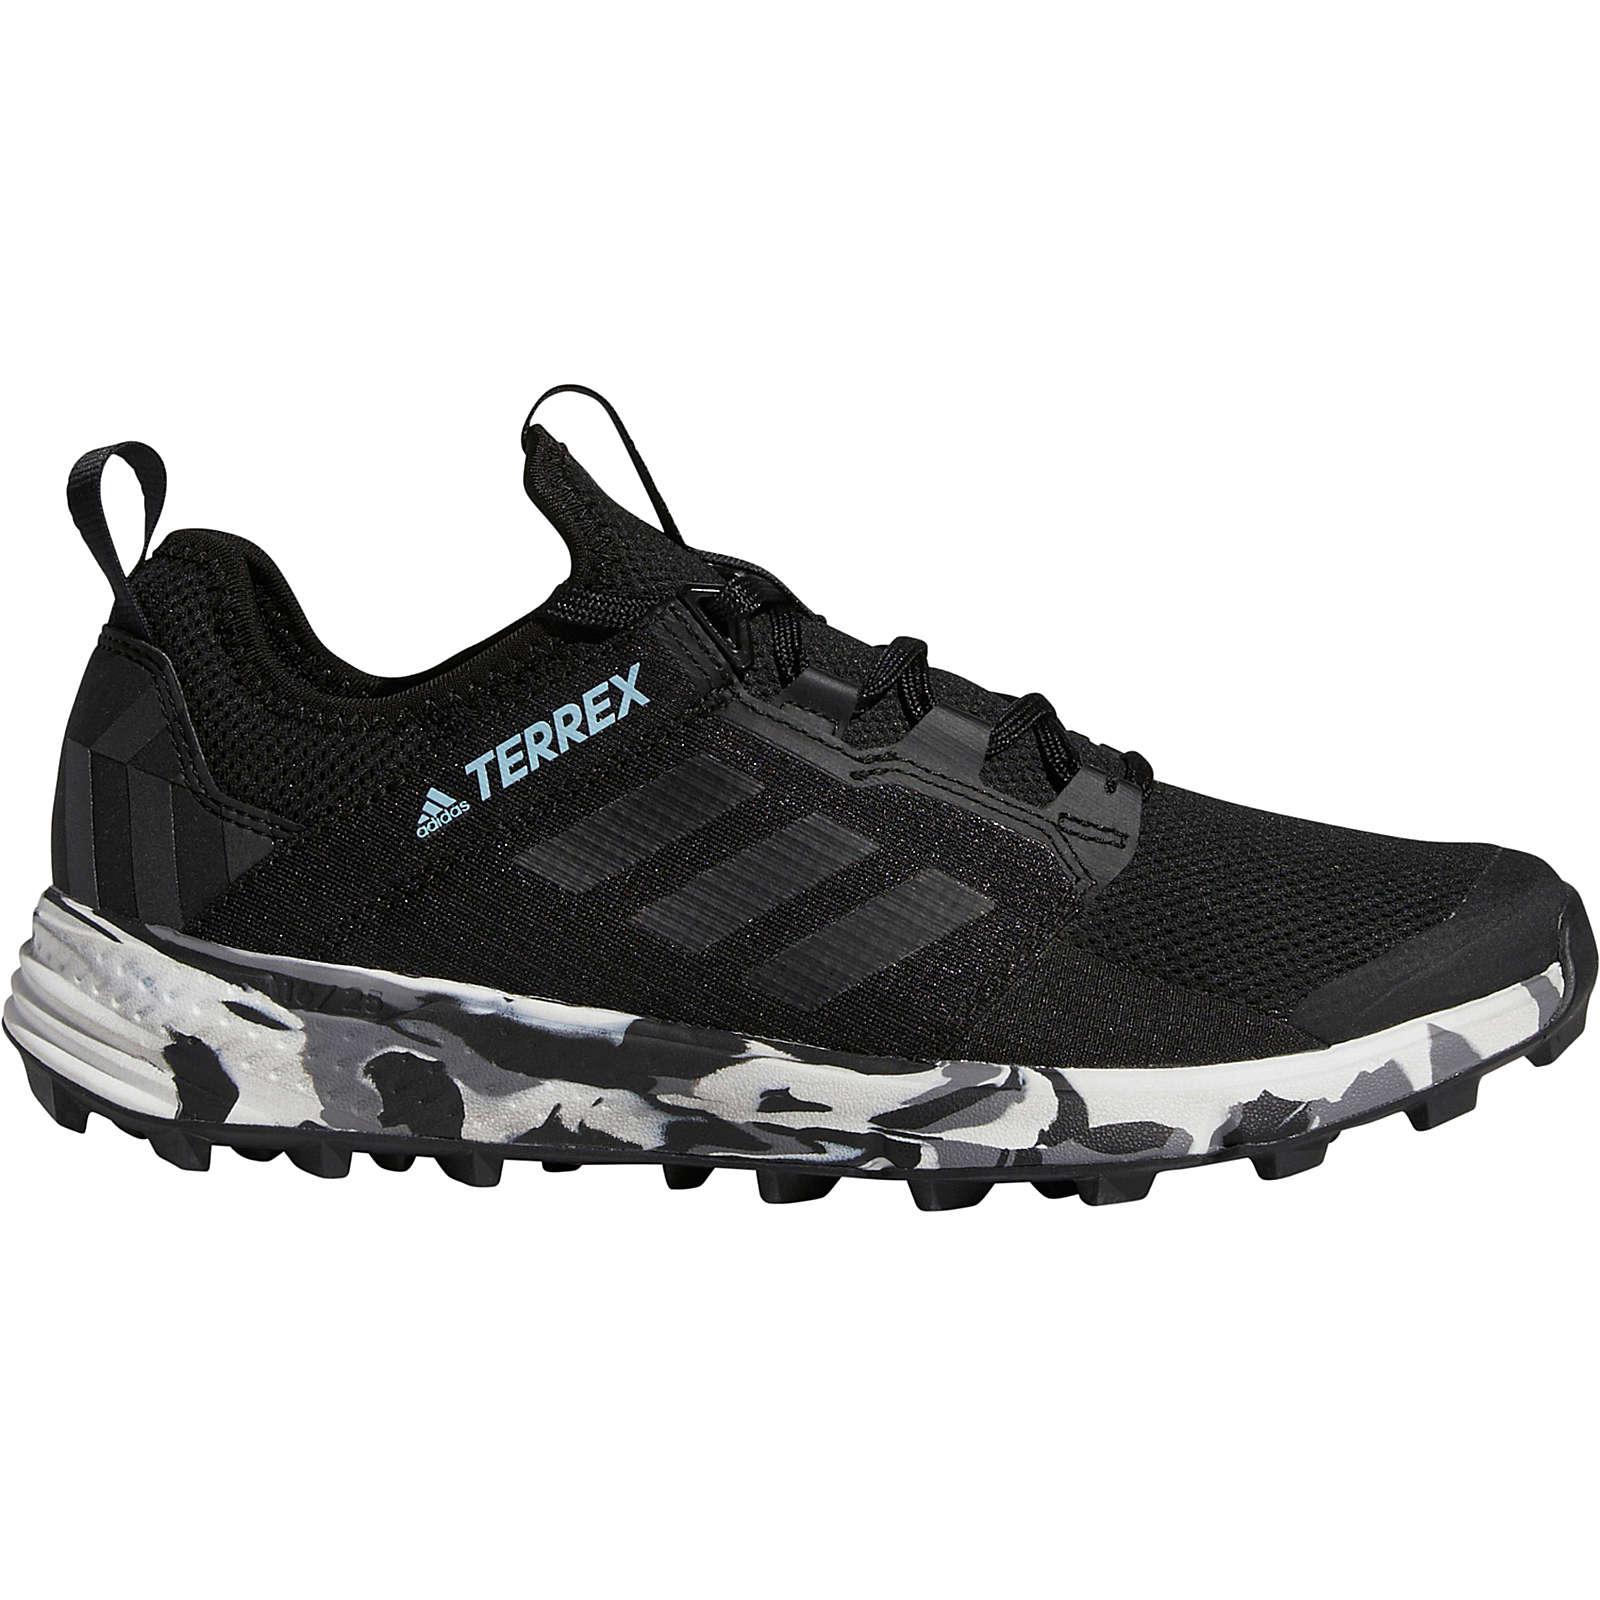 adidas TERREX Mountain Running Schuhe Agravic Speed+ Laufschuhe schwarz Damen Gr. 37 1/3